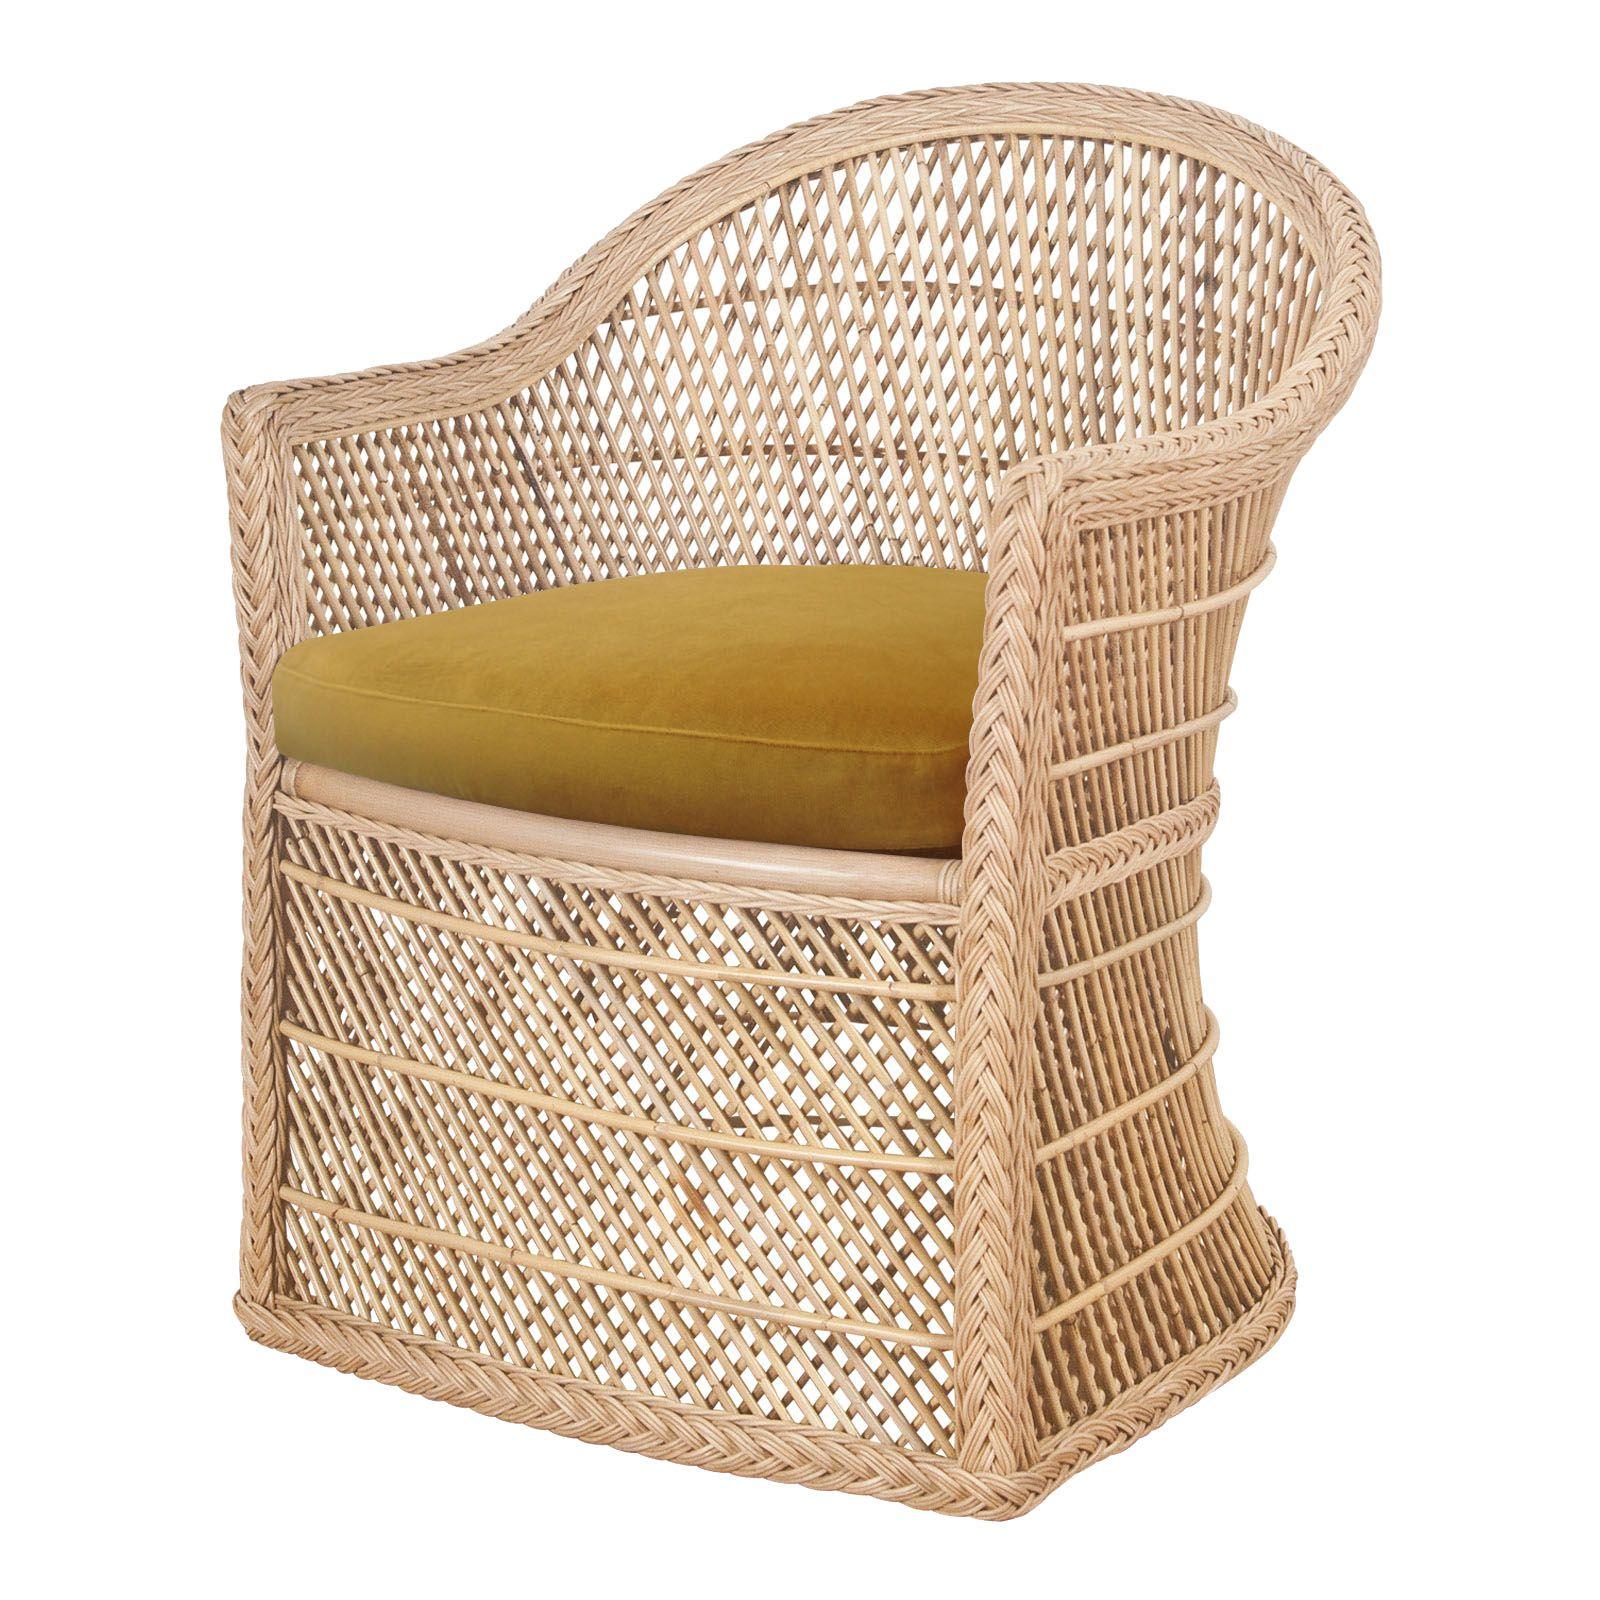 Tahitian Chair Natural | Chair, Rattan, Rattan furniture